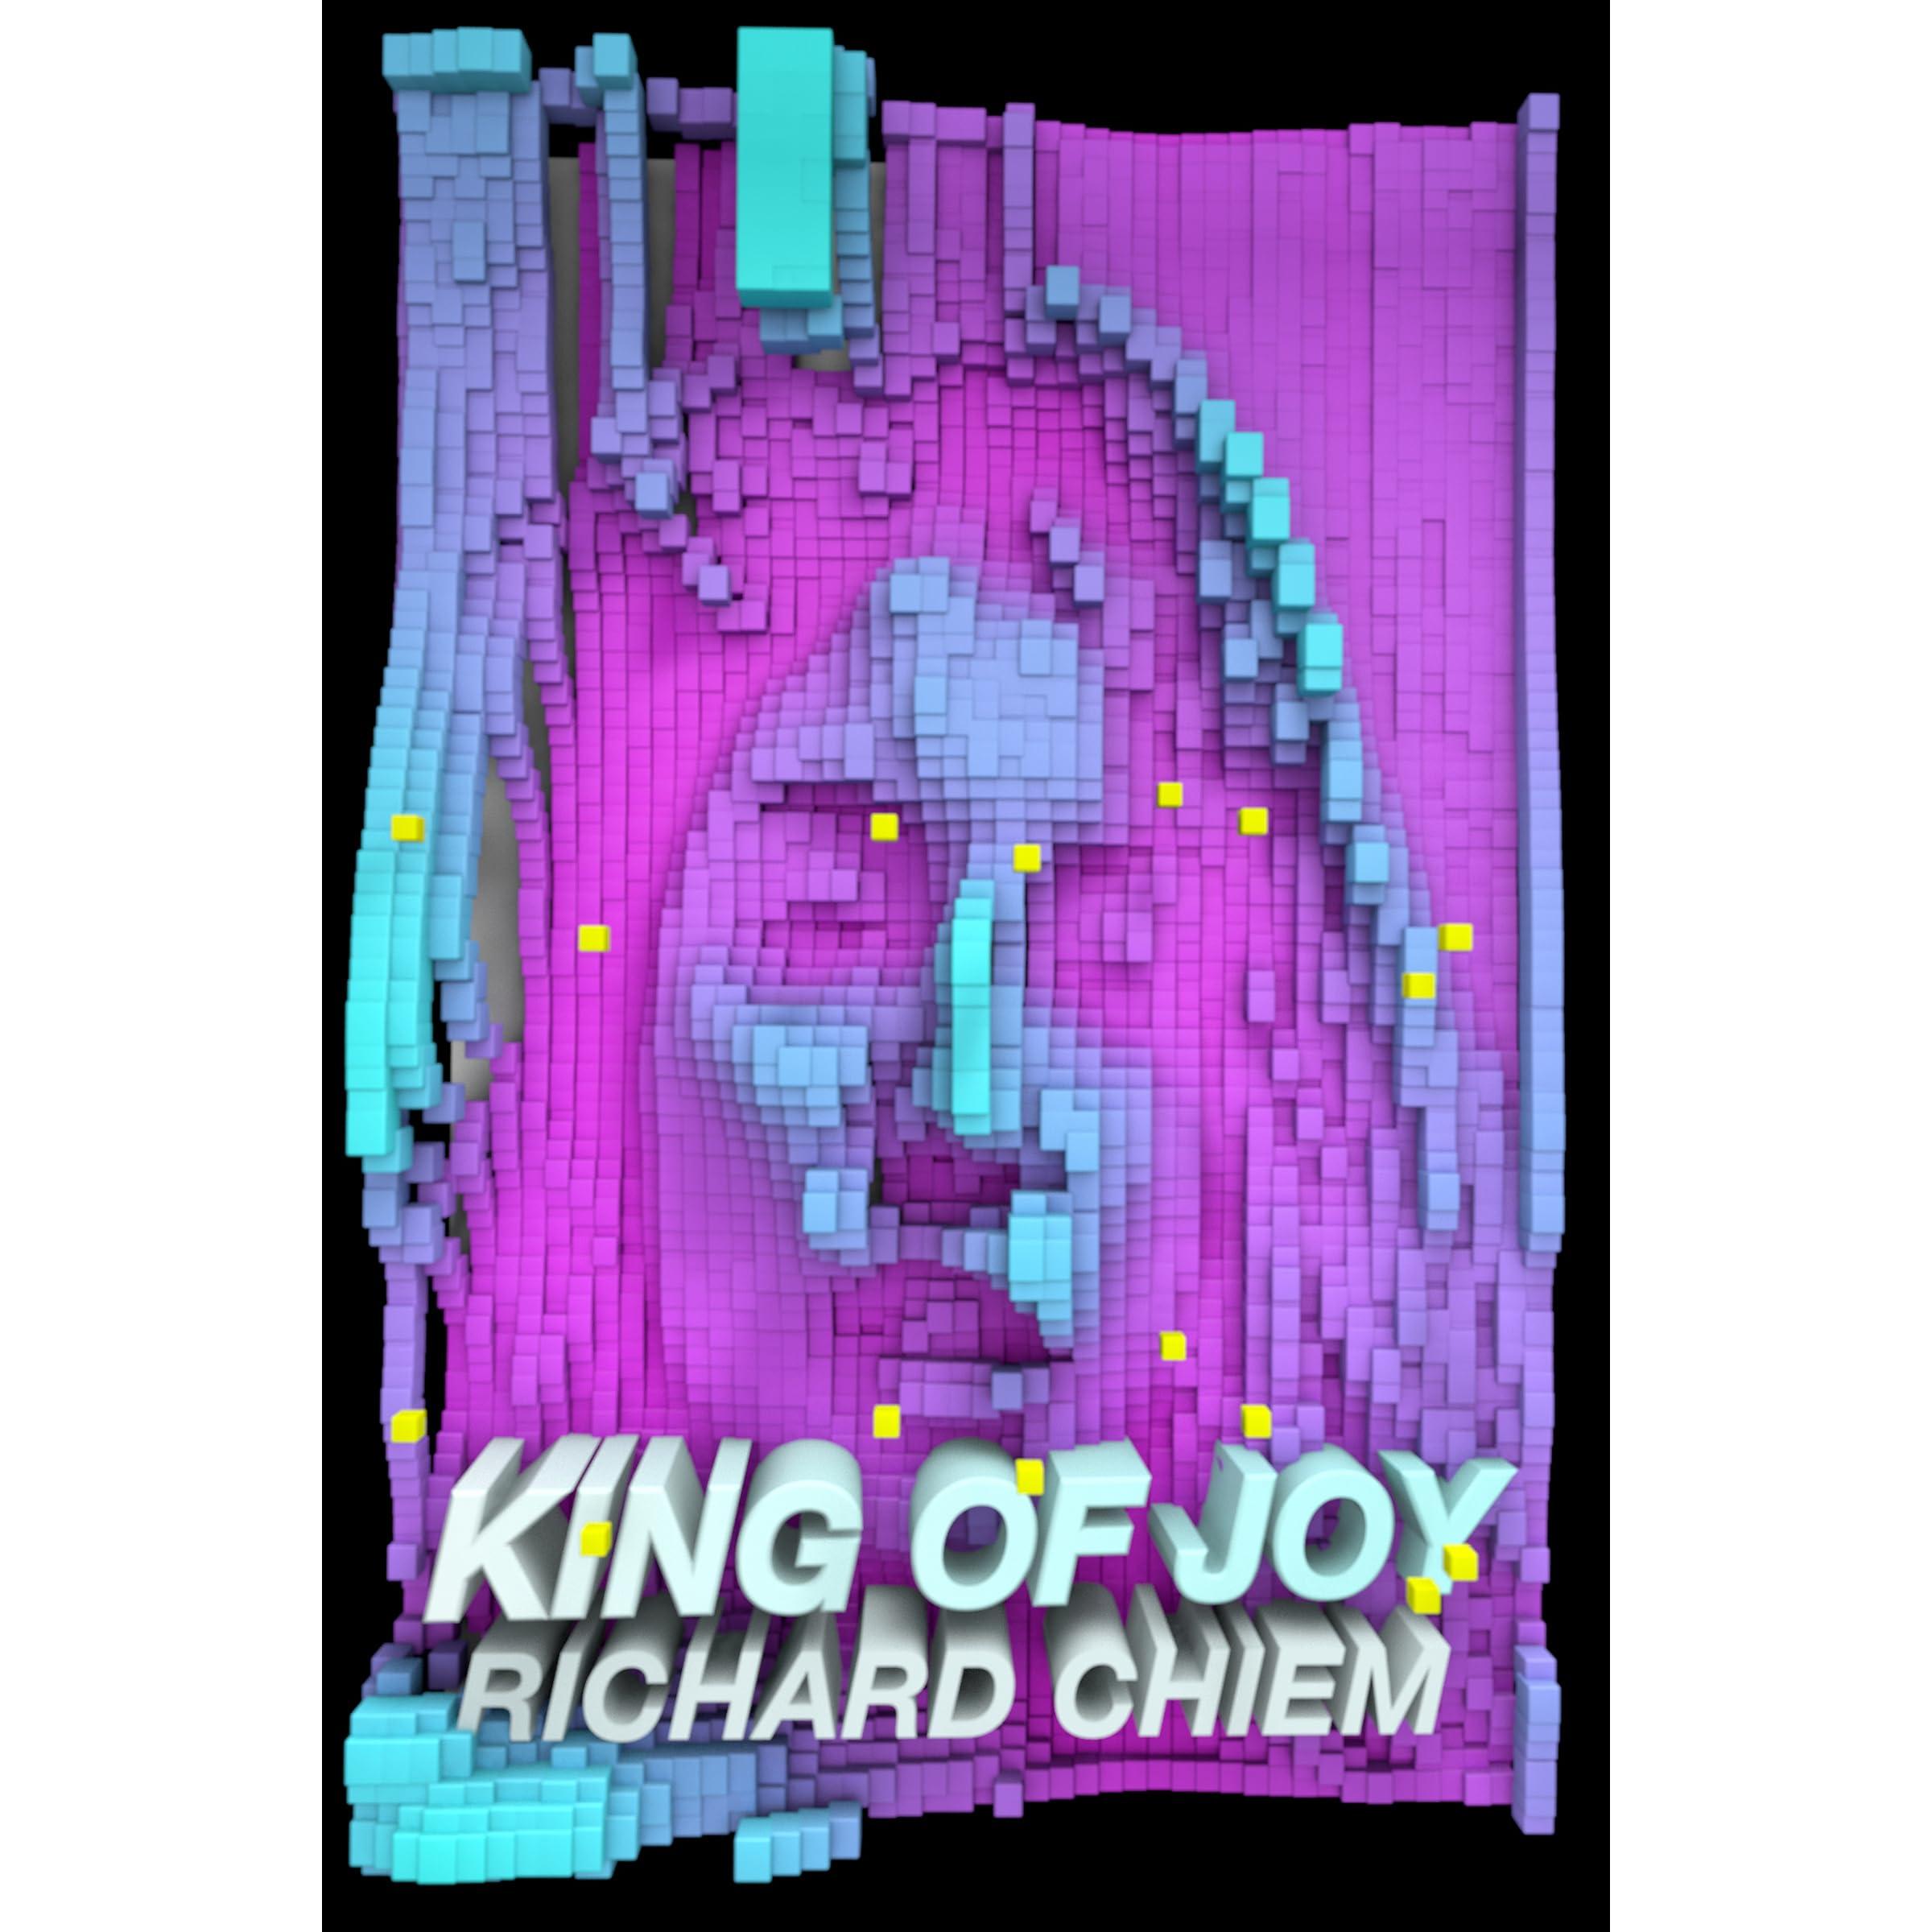 Ebook King Of Joy By Richard Chiem